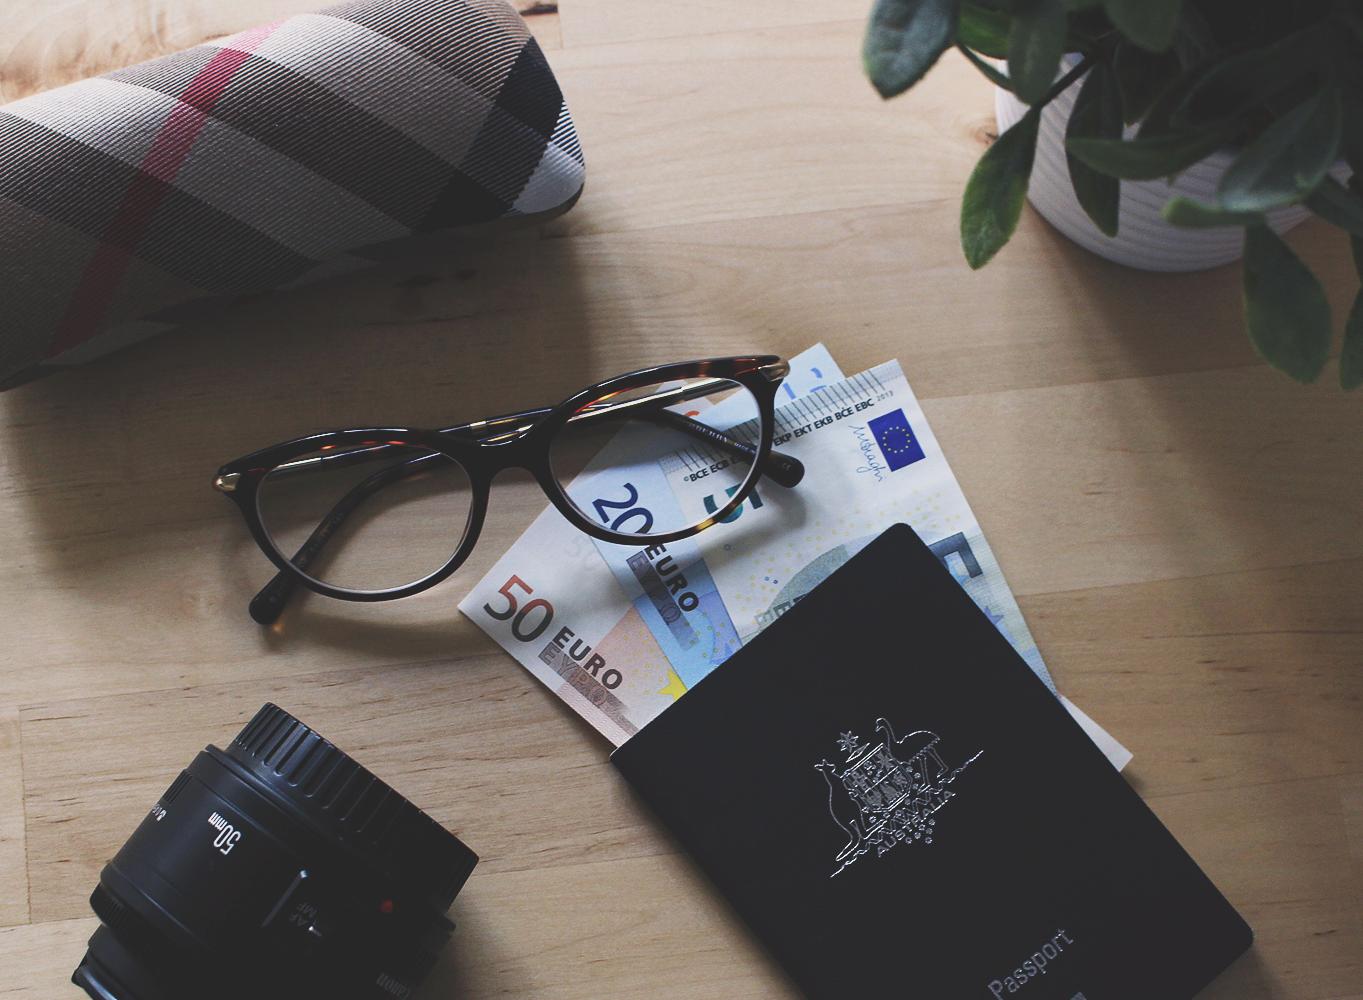 Travel Essentials, Bramble and Thorn, Travel Diaries, Travel Checklist